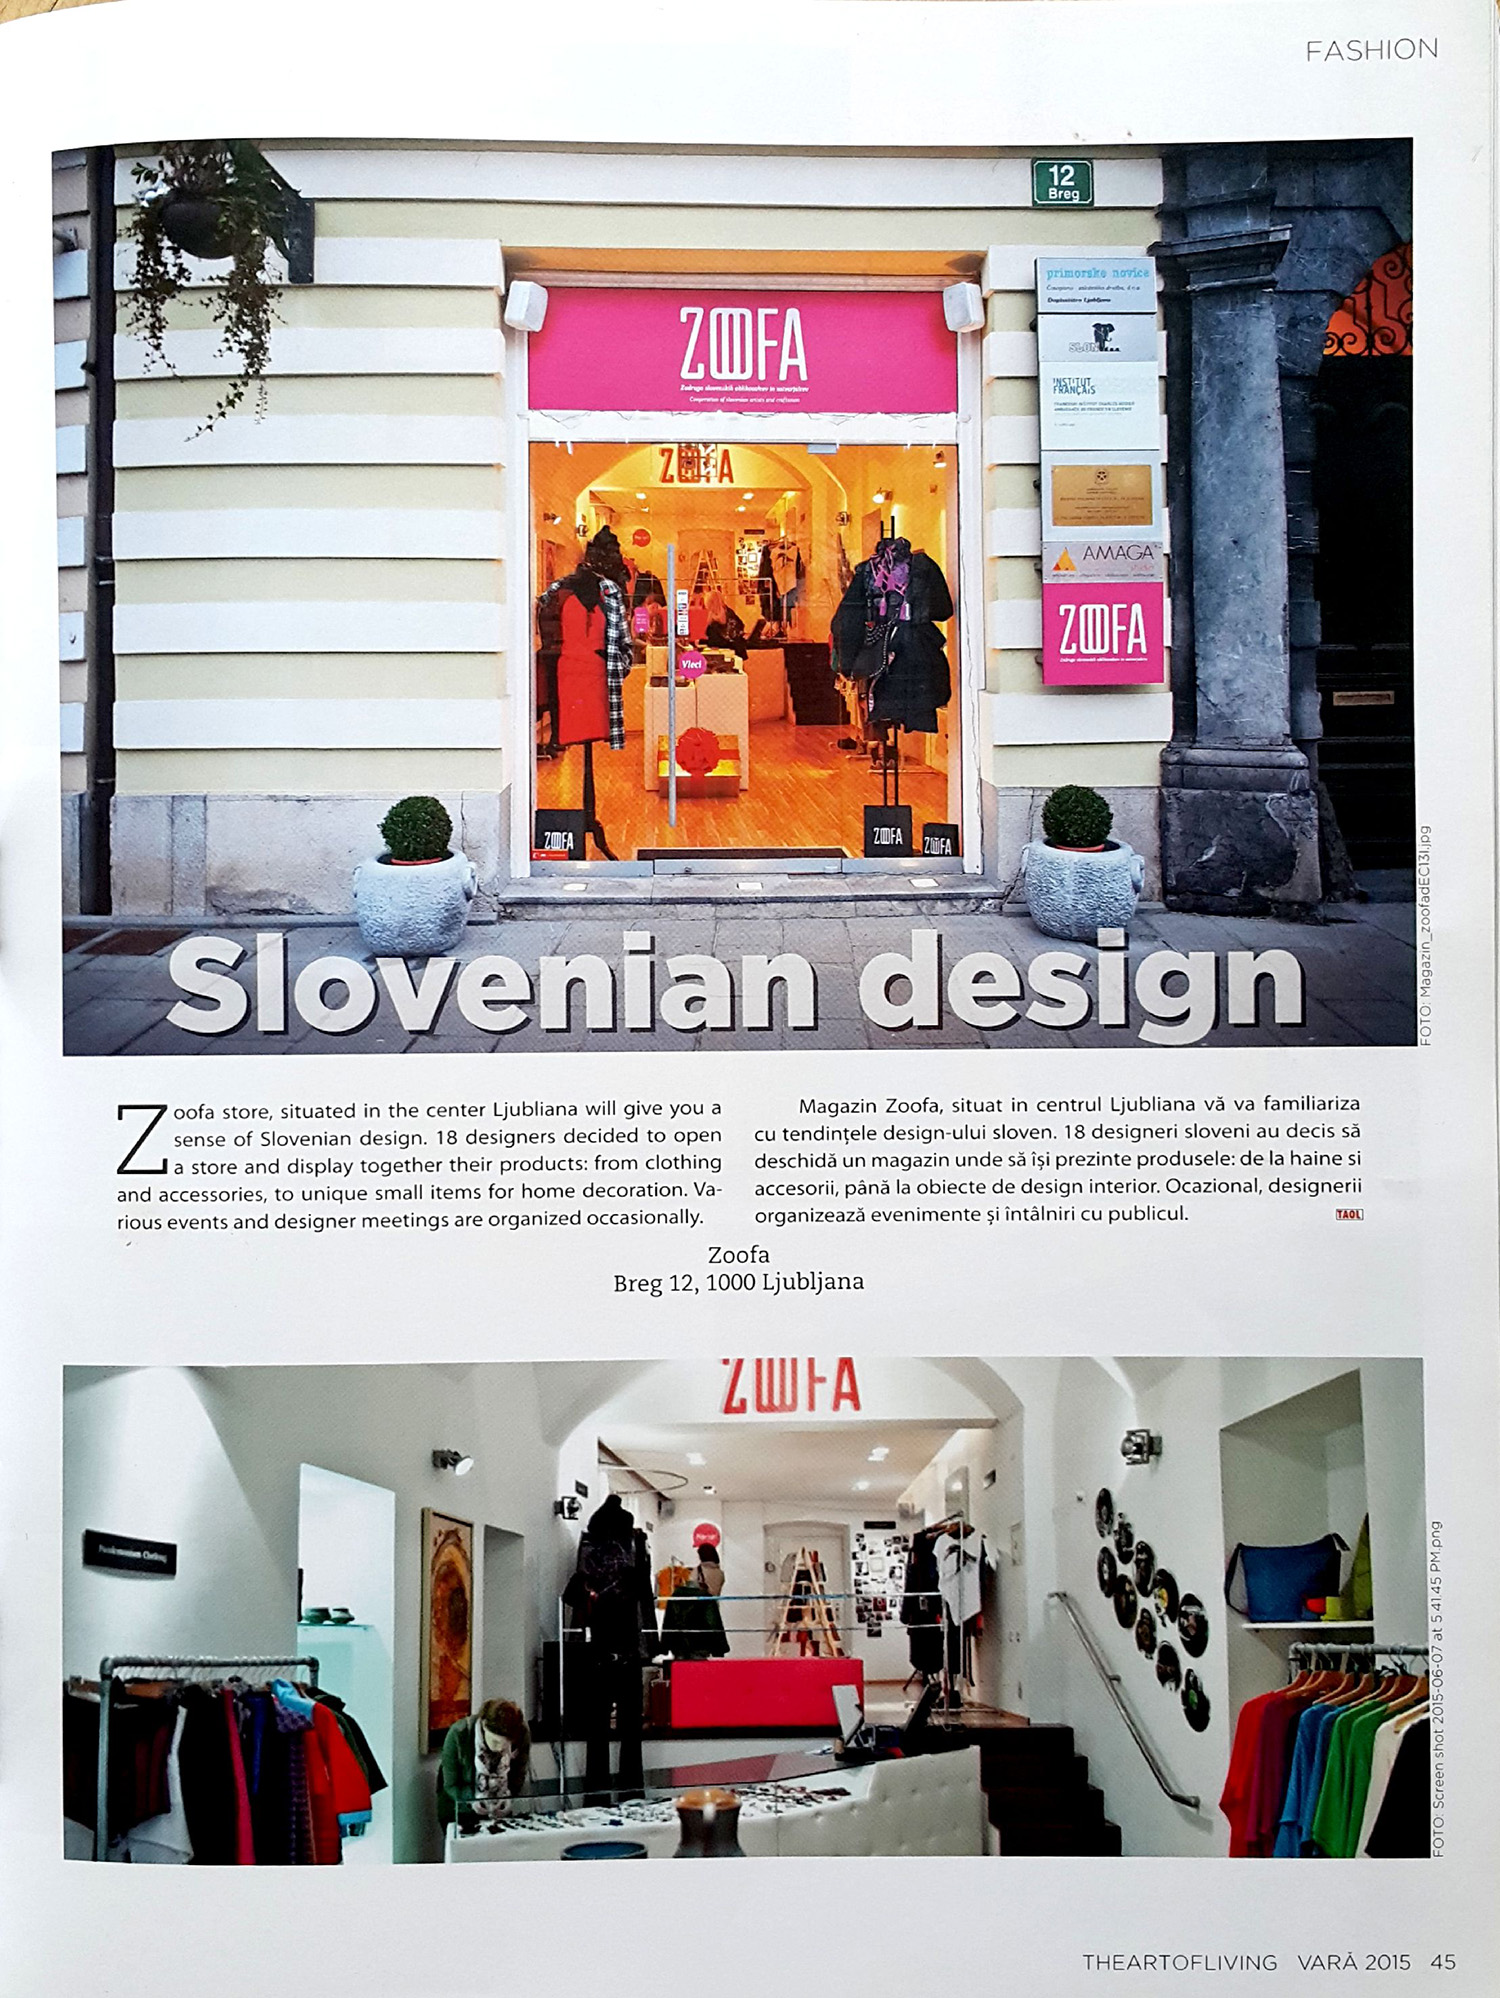 Slovenian design